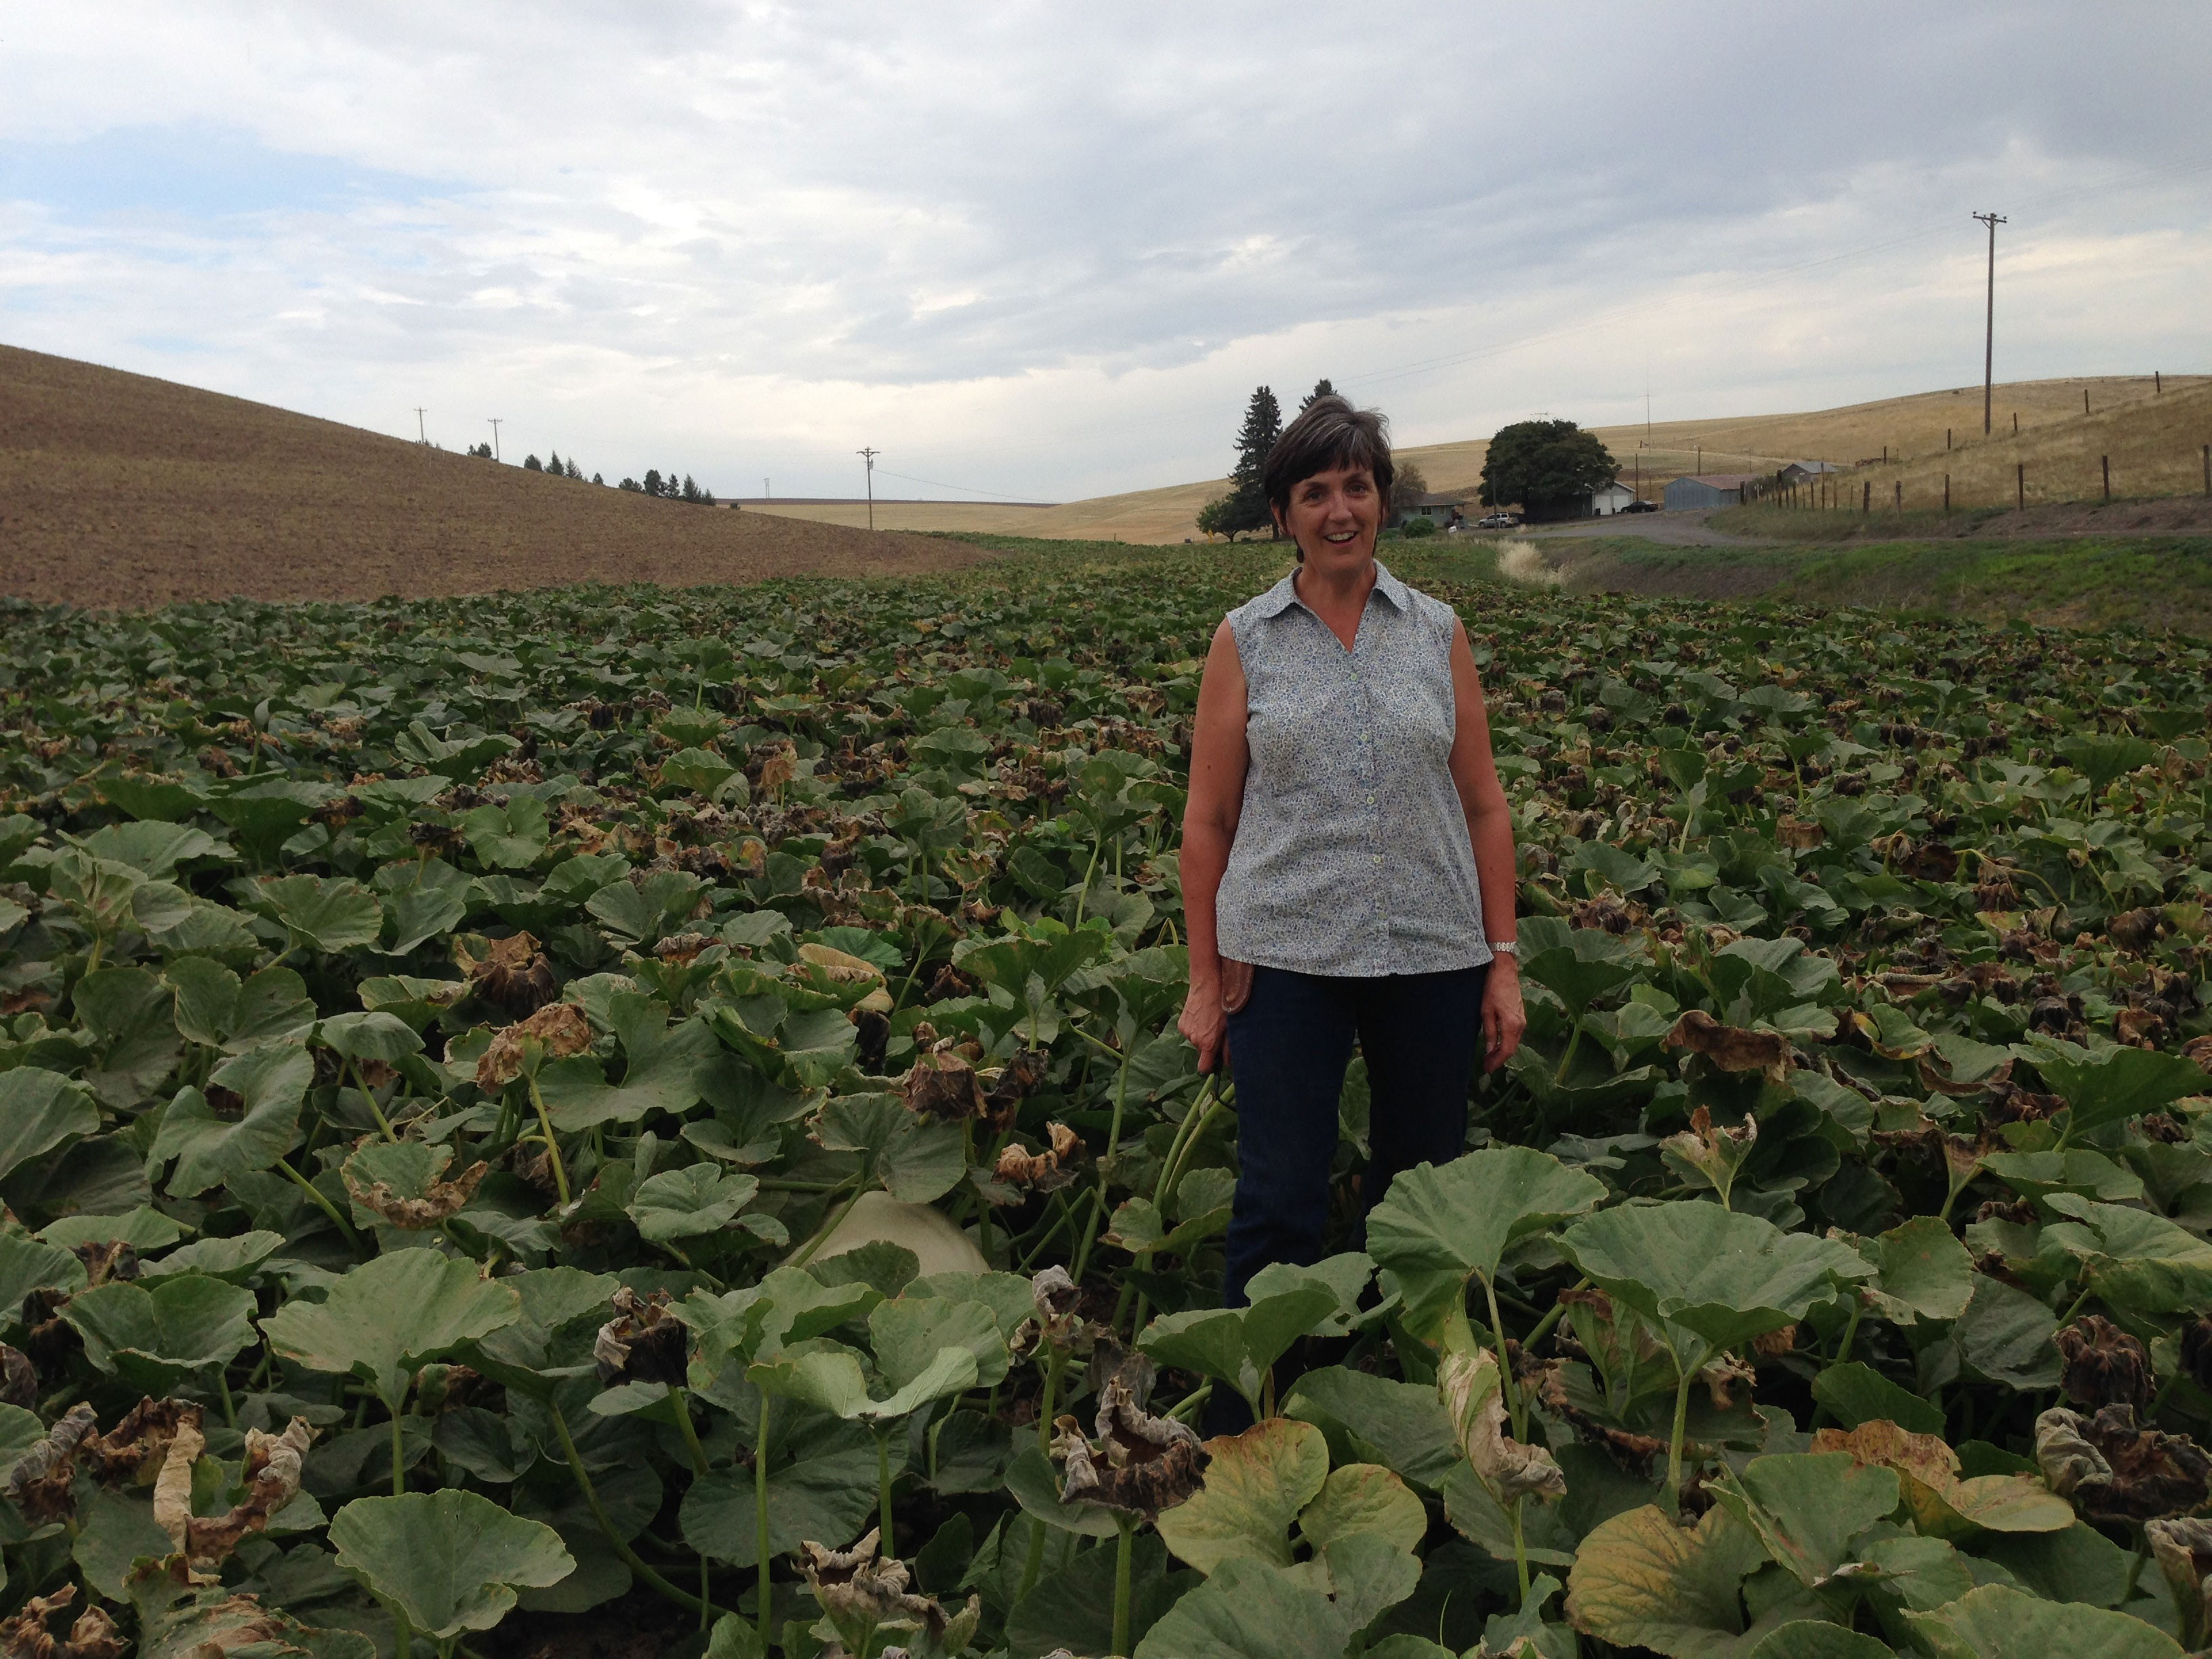 Polly Dennler stands in a field full of pumpkins.